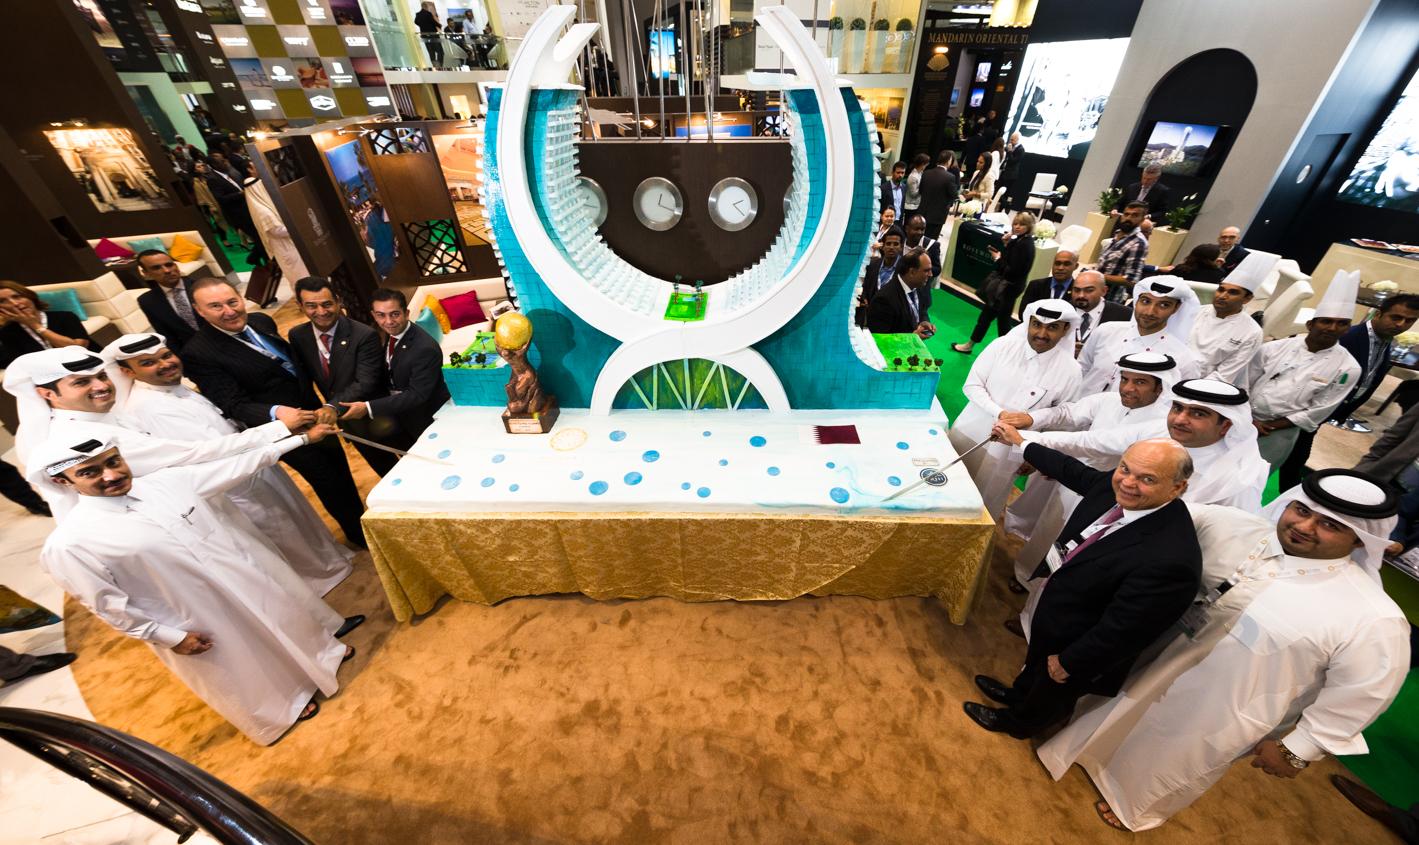 Qatar Stands Hospitality Qatar